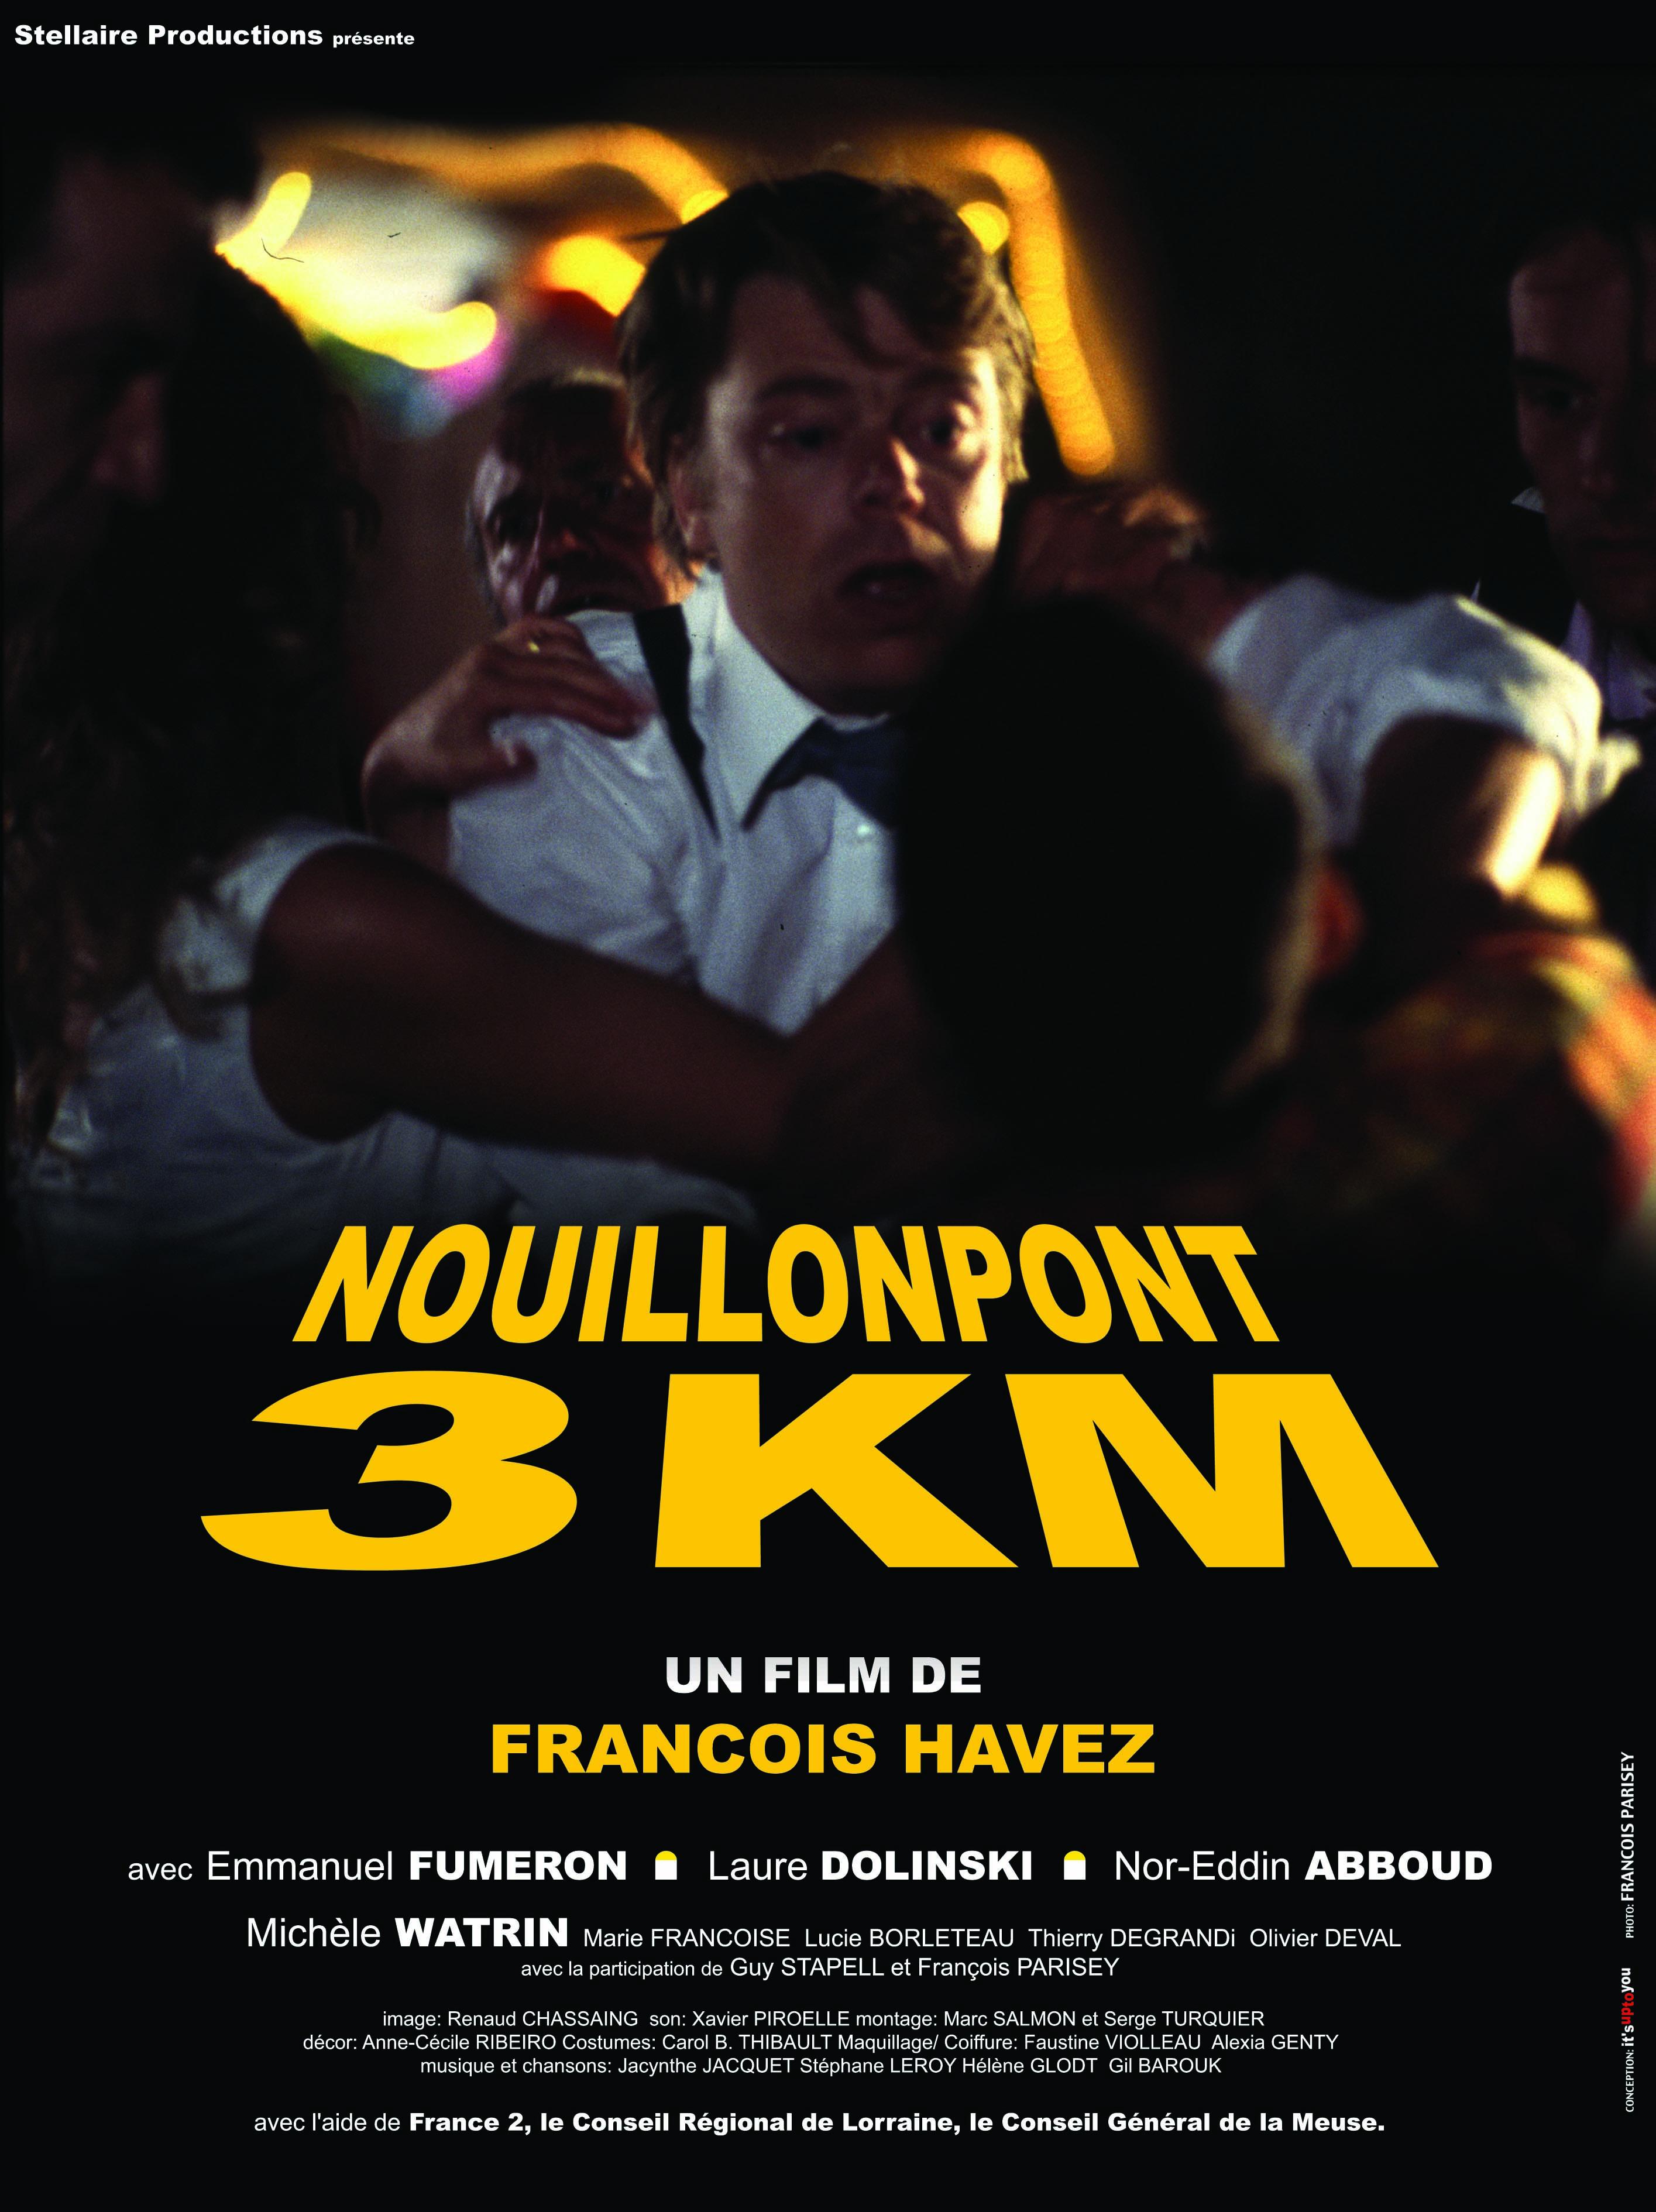 Nouillonpont 3 Km 2004 Imdb